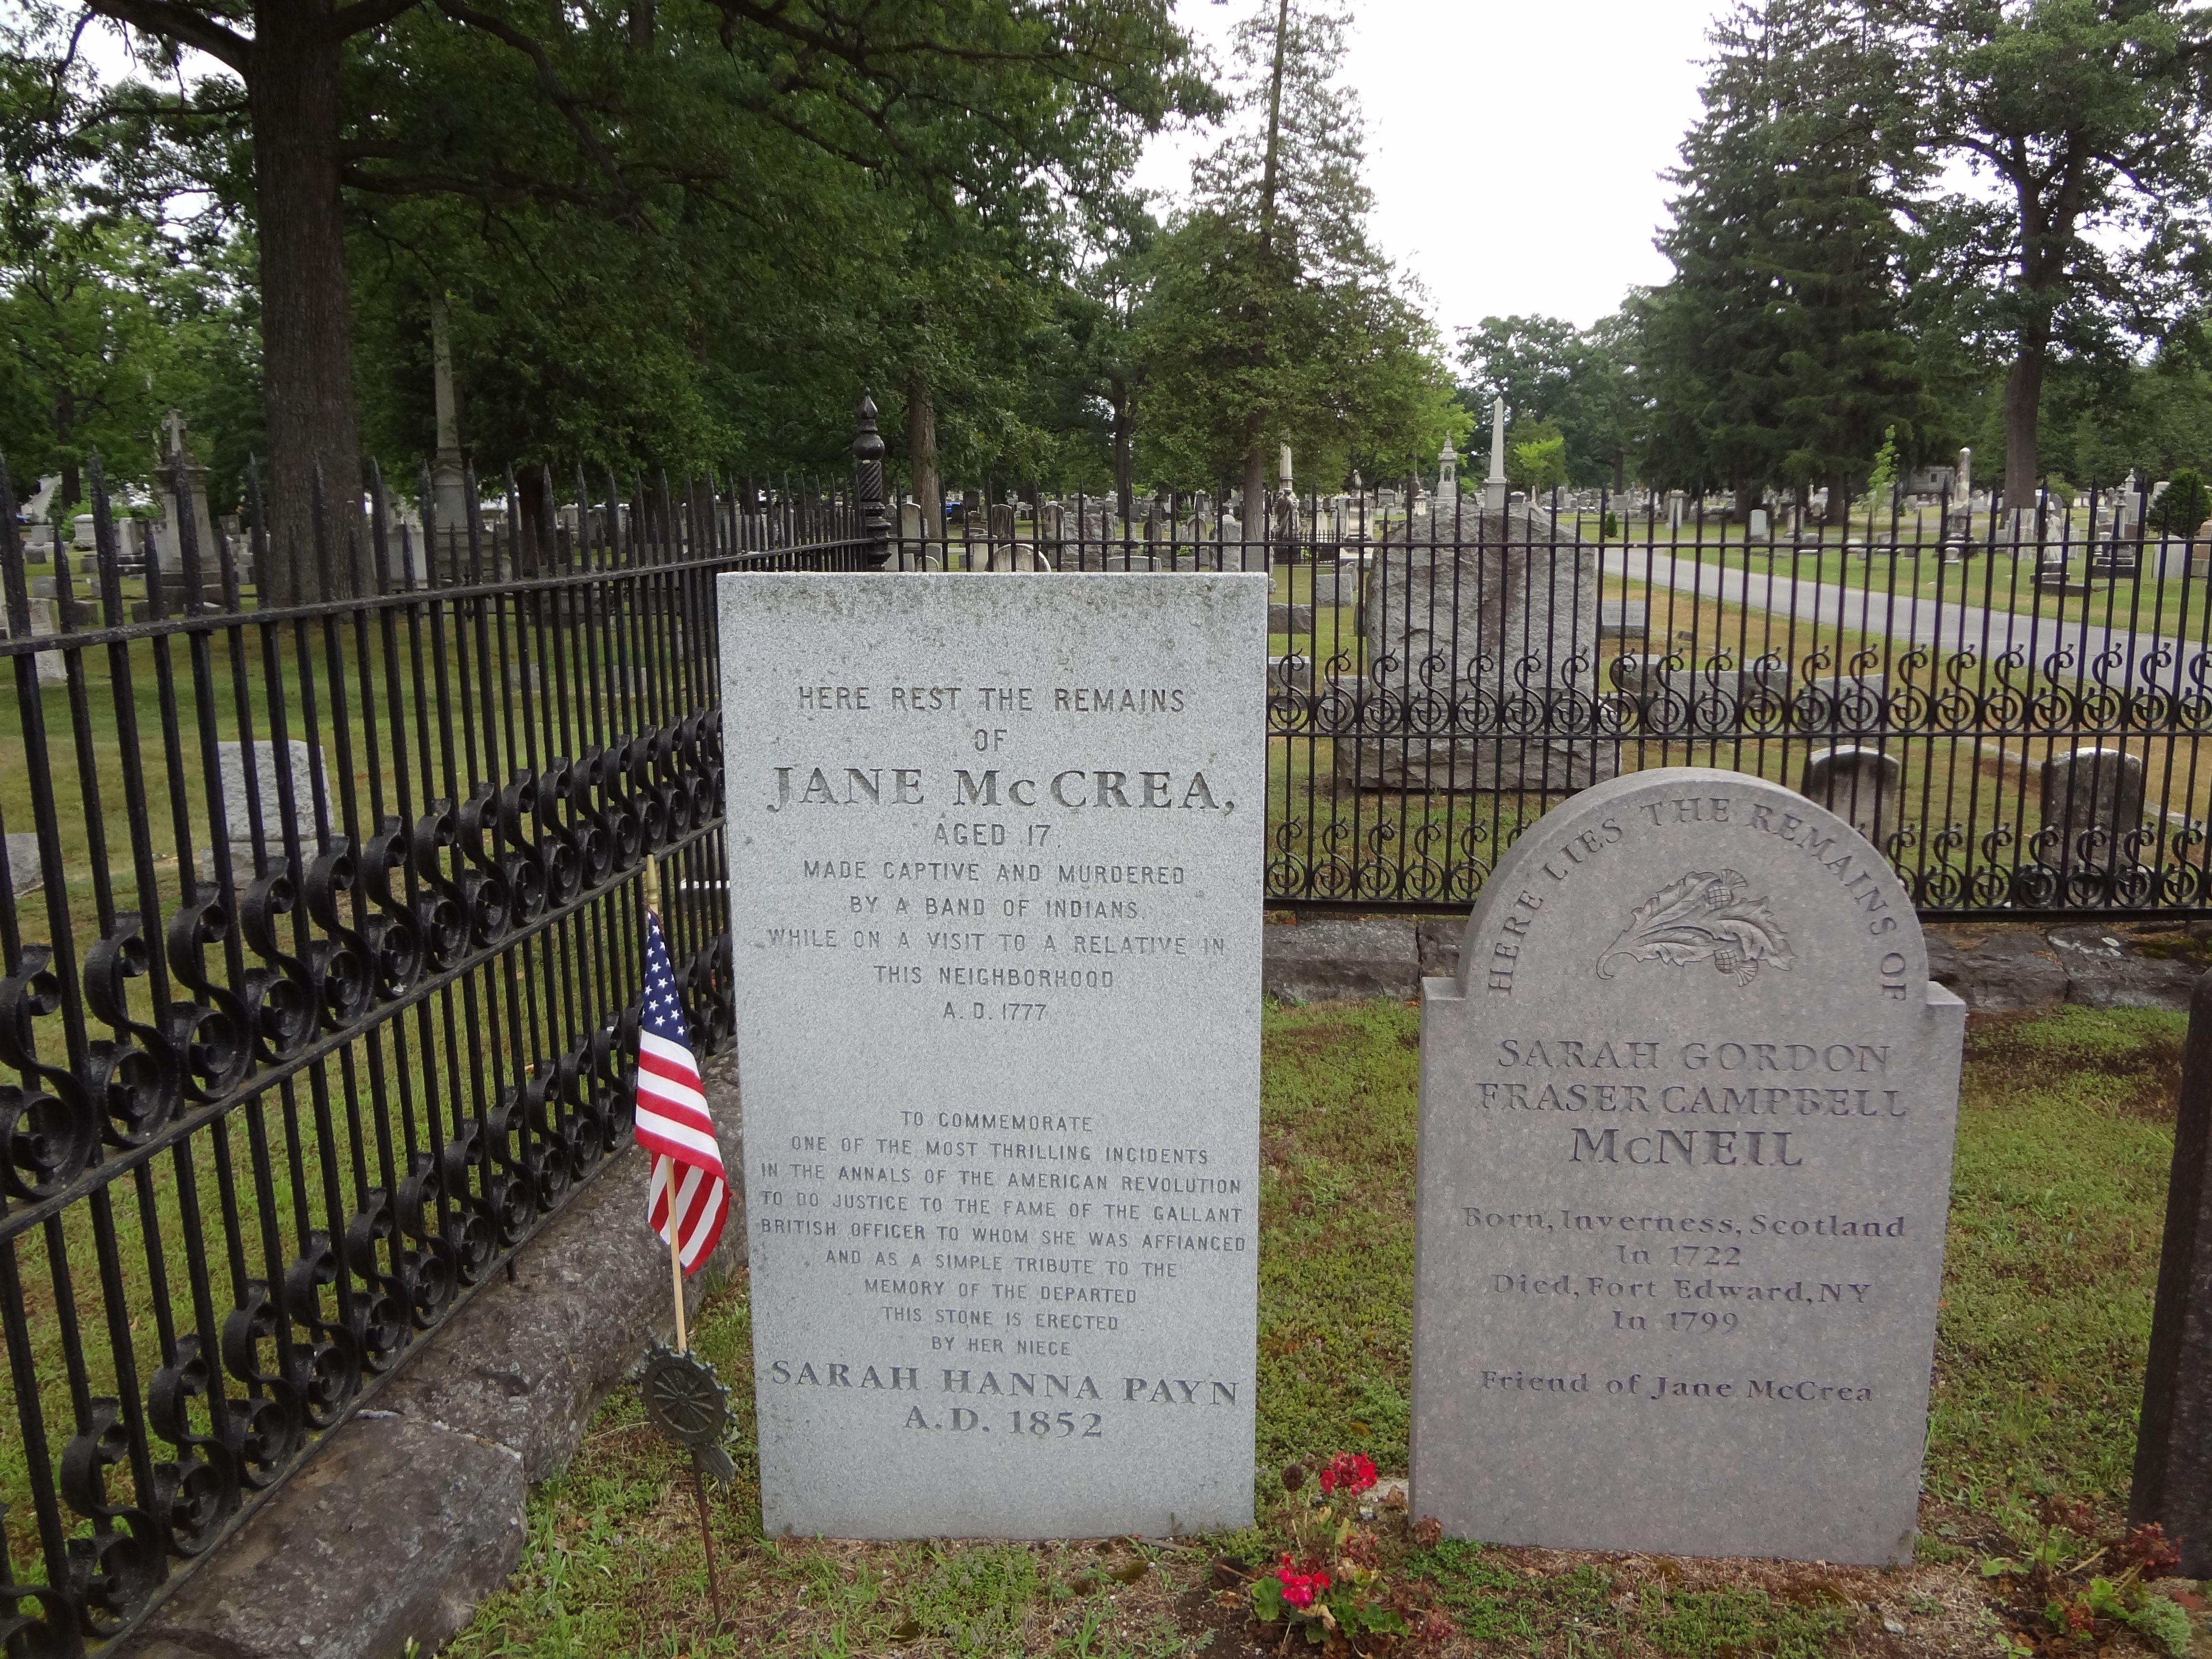 Jane McCrea grave site   Fort Edward, NY